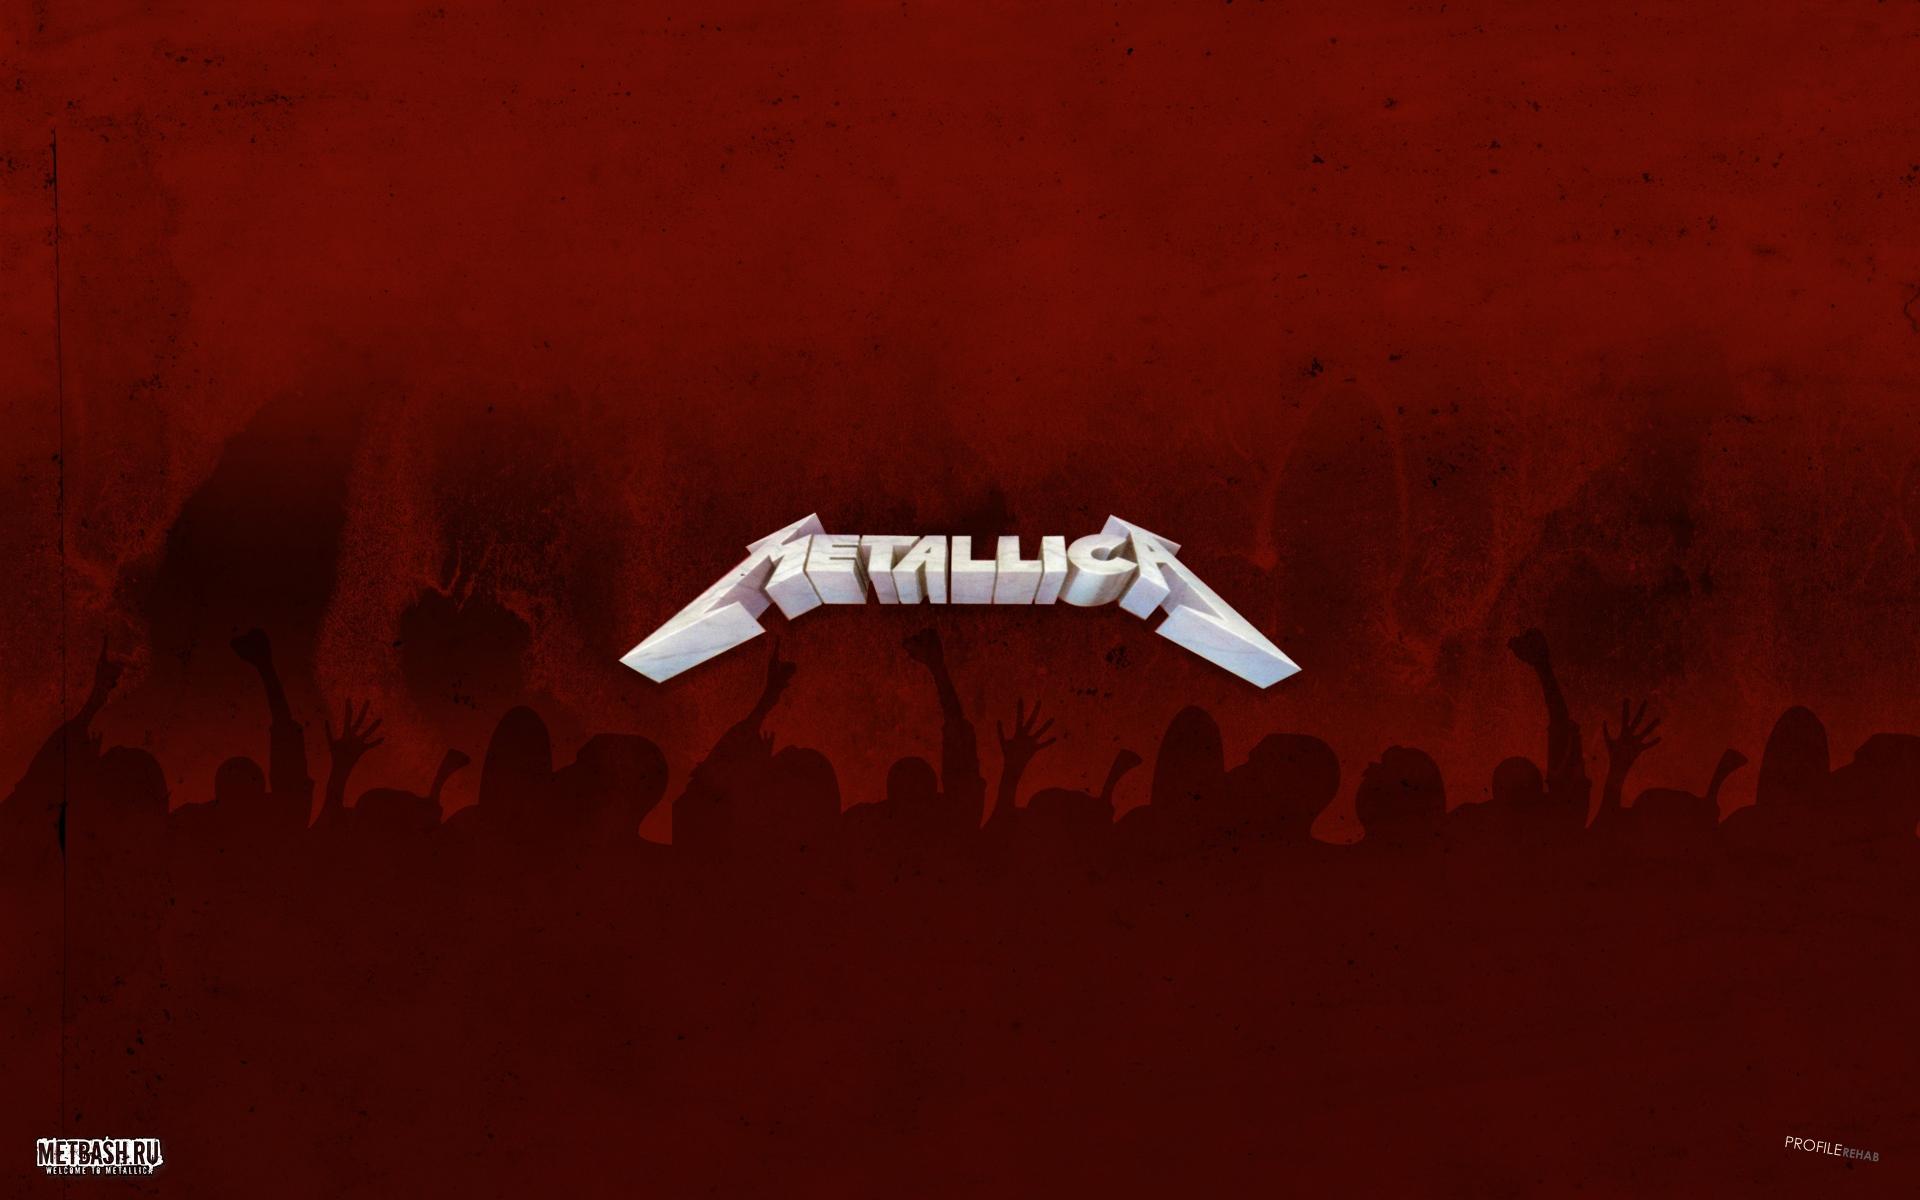 metallica logo wallpaper 985217